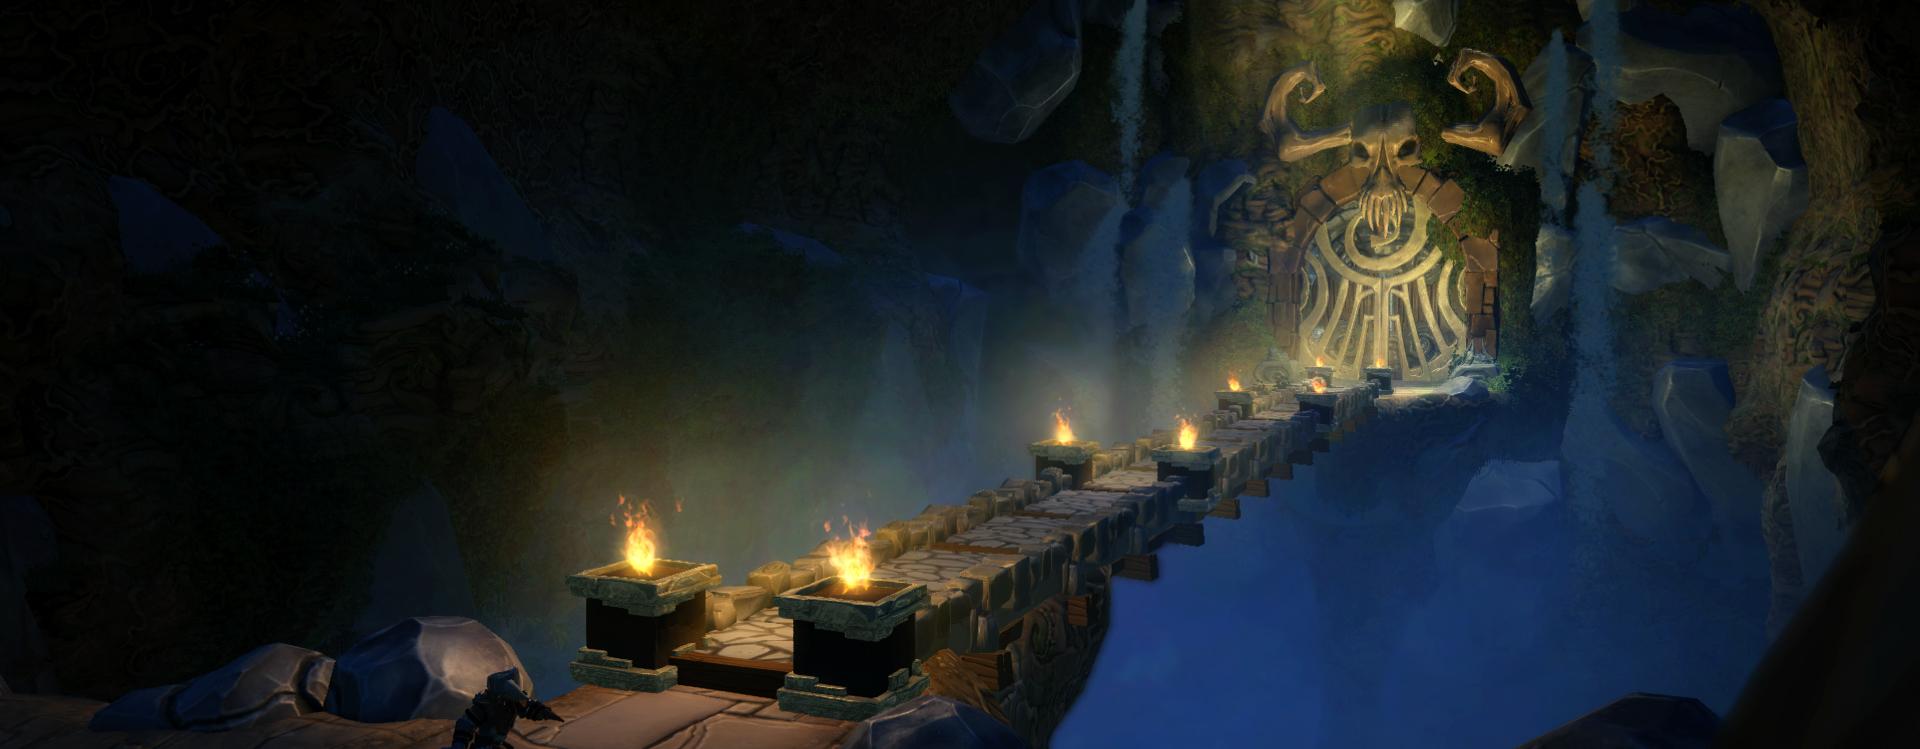 In-game walkway scene